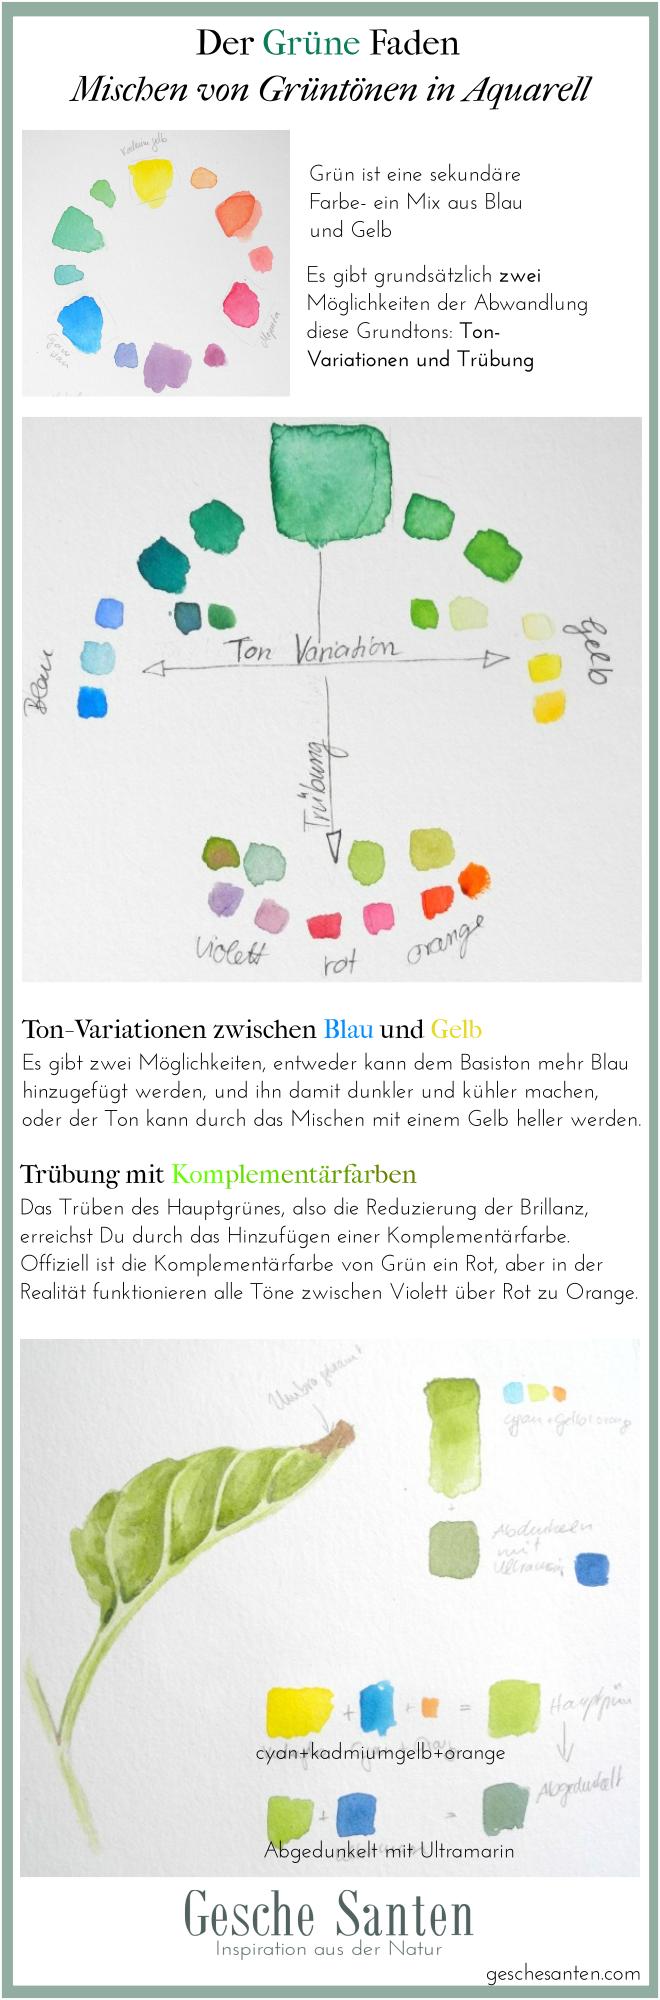 Komplementärfarbe Zu Grün der grüne faden mischen grüntönen in aquarell watercolor